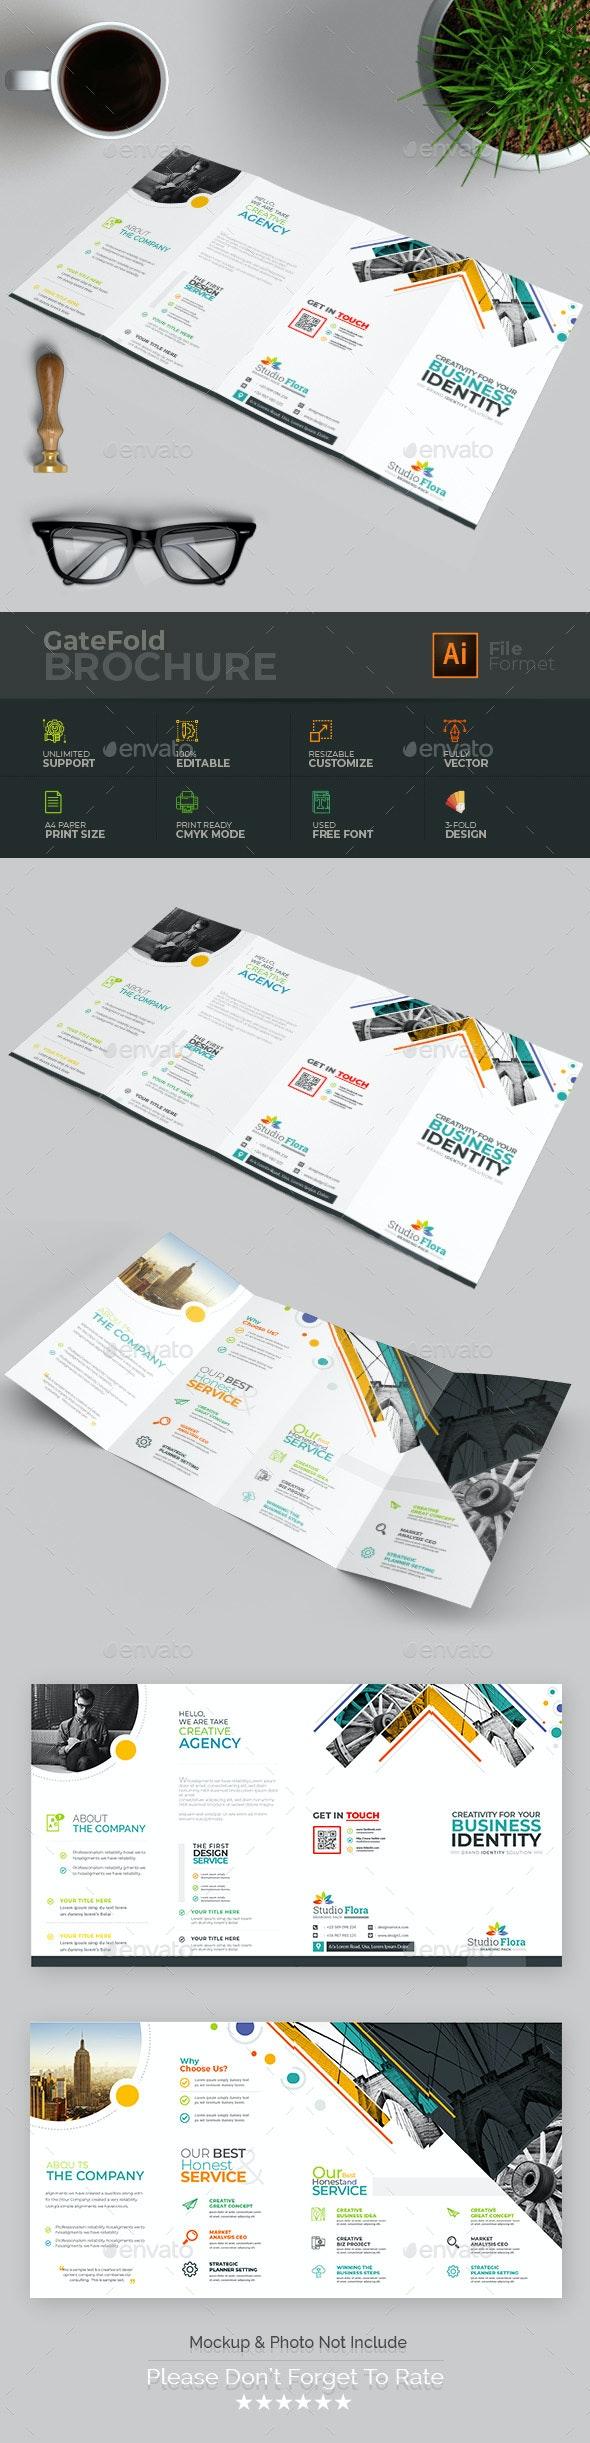 Double Gate-Fold Brochure - Brochures Print Templates